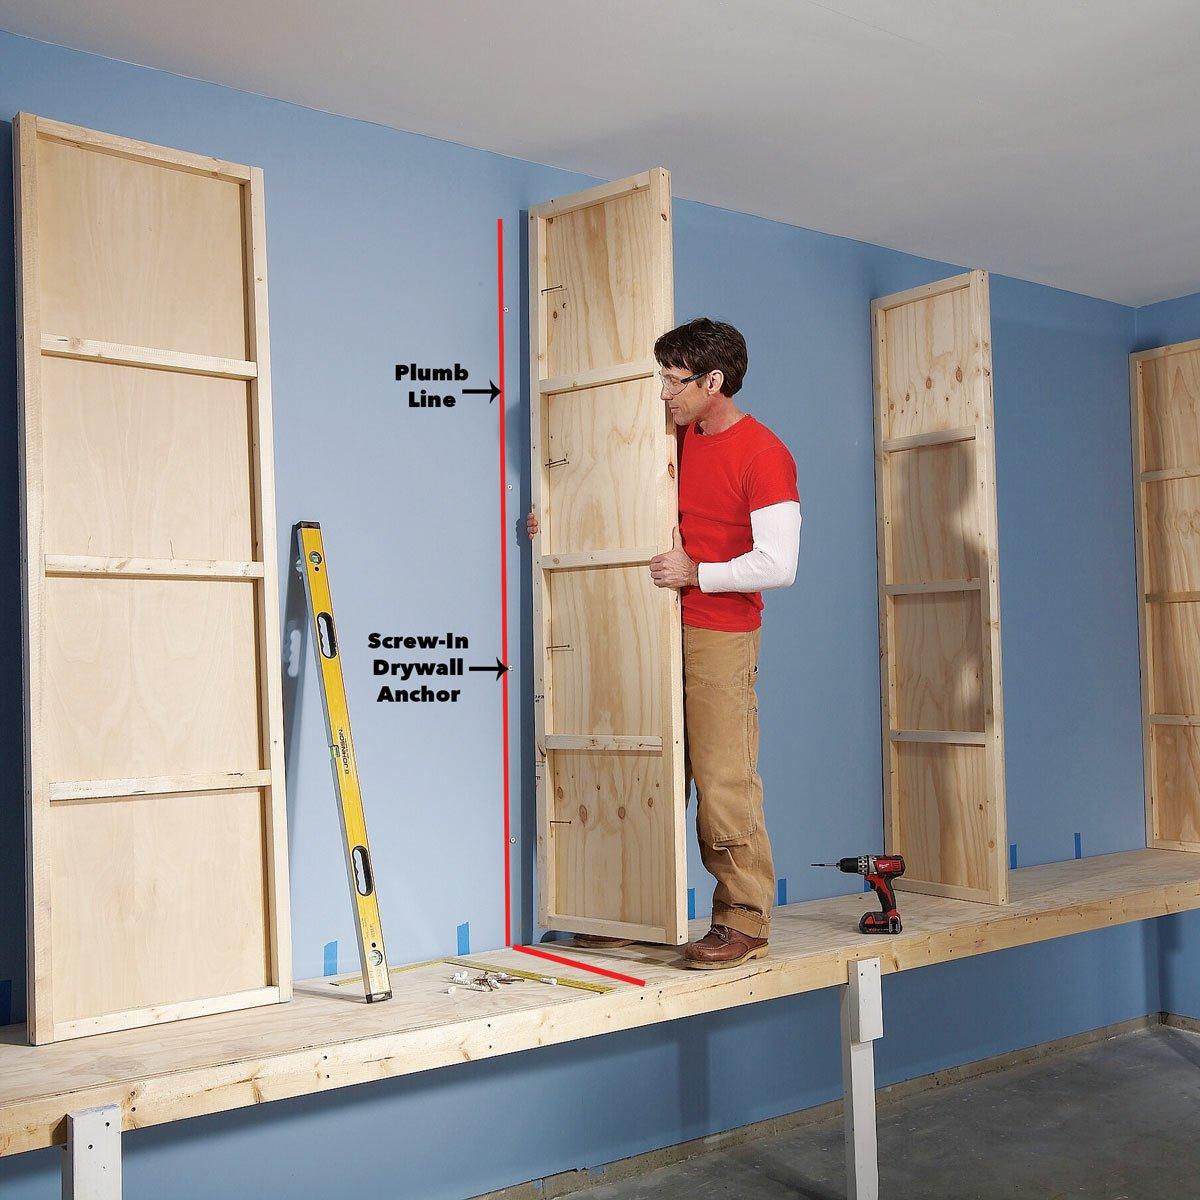 giant diy garage cabinet floating storage attach uprights cabinets inch brackets triangle corner bookcase fermod shelving black island bench towel rail with shelf oak style adding